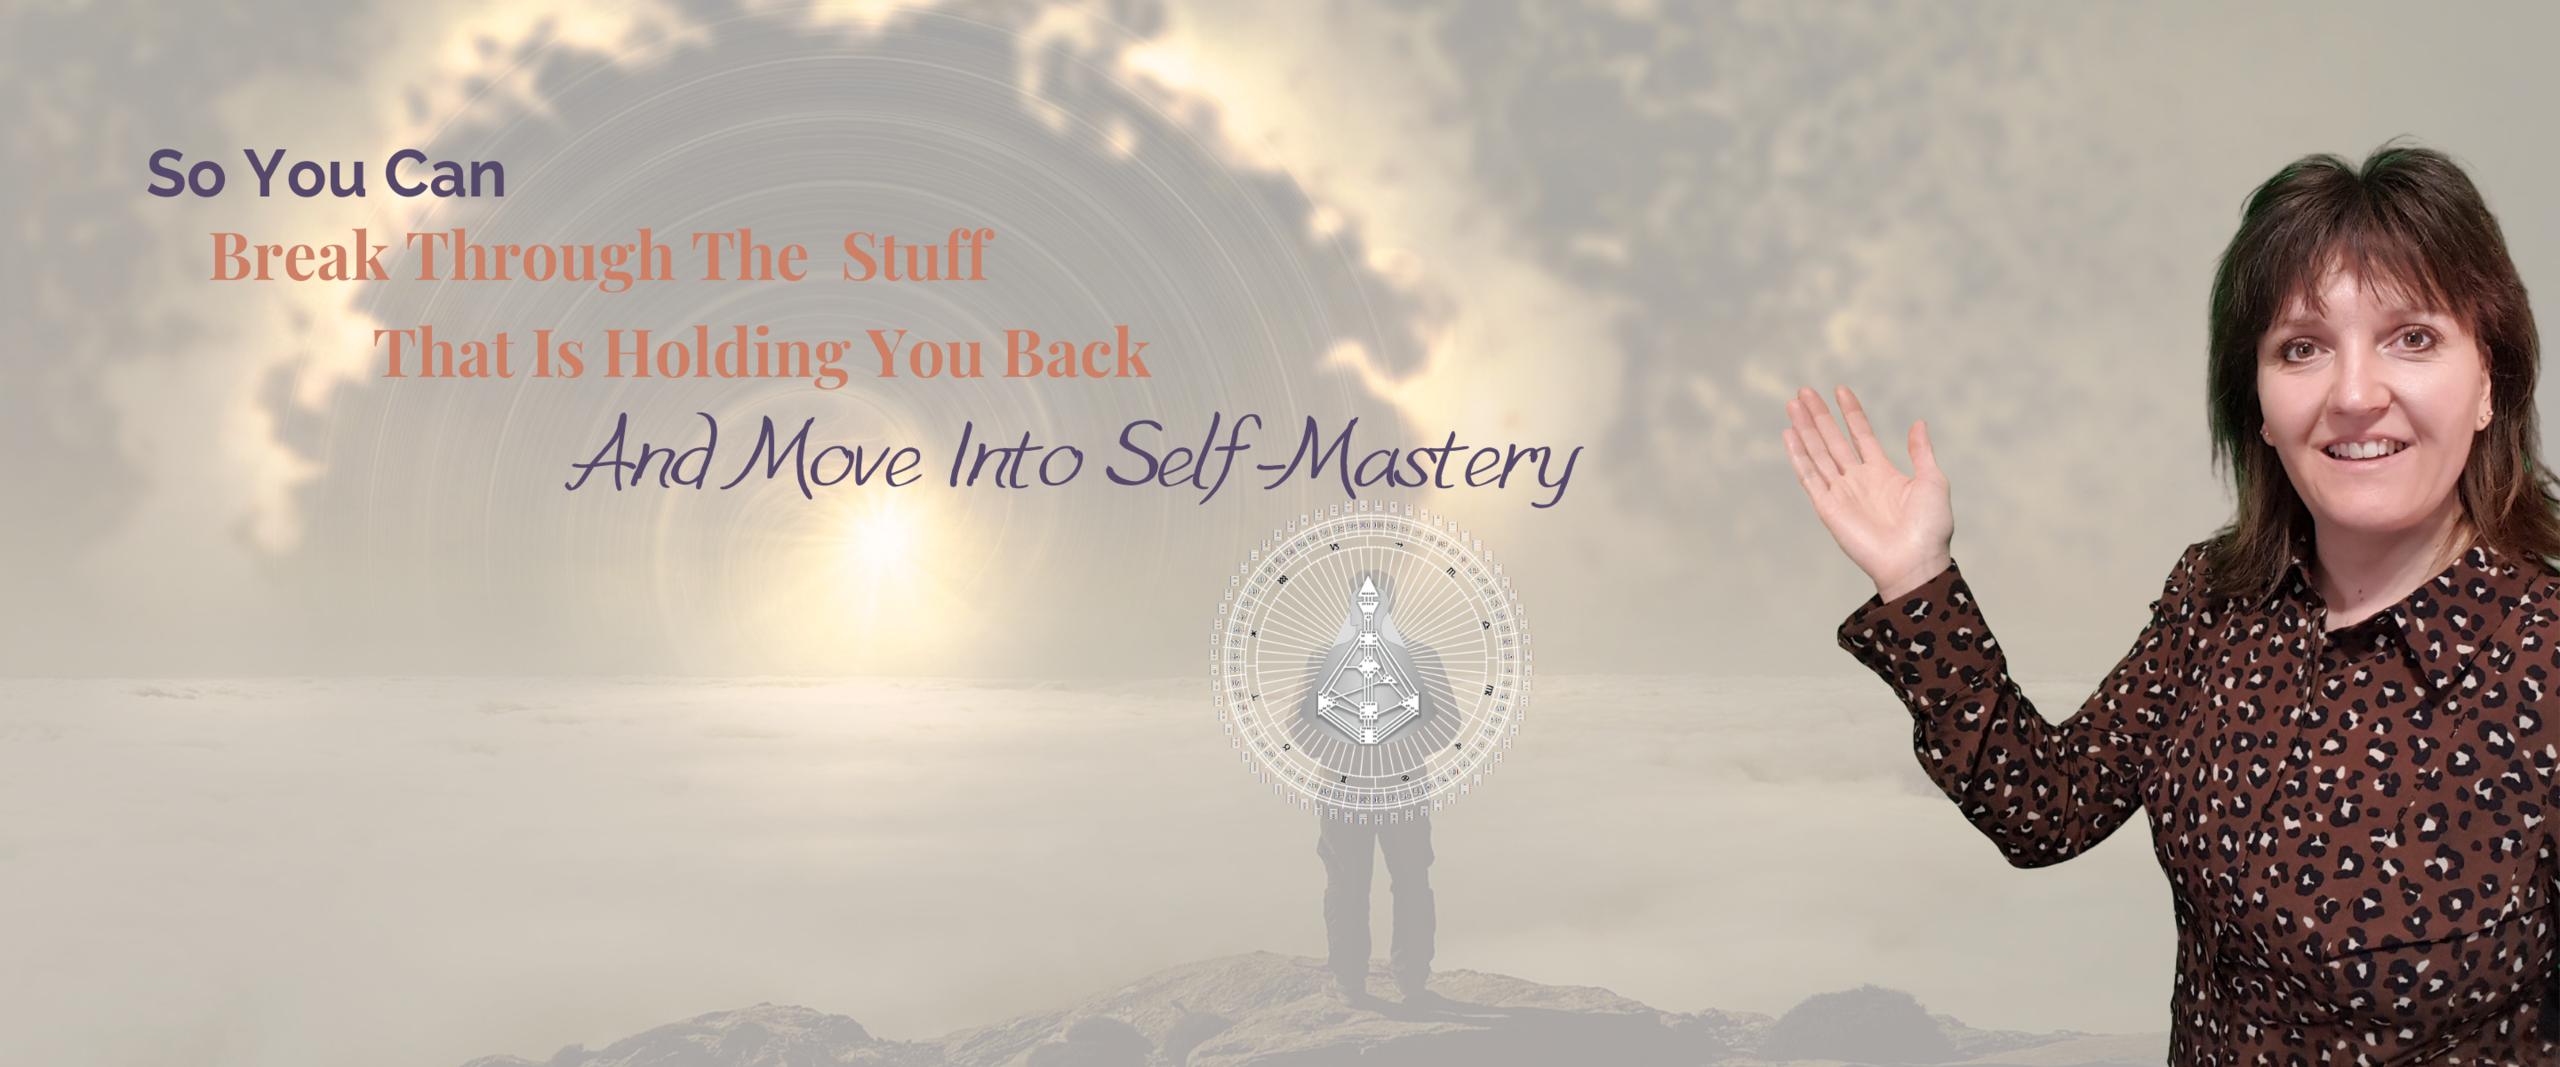 Leann Wolff| Self Mastery| Human Design| Power of Self